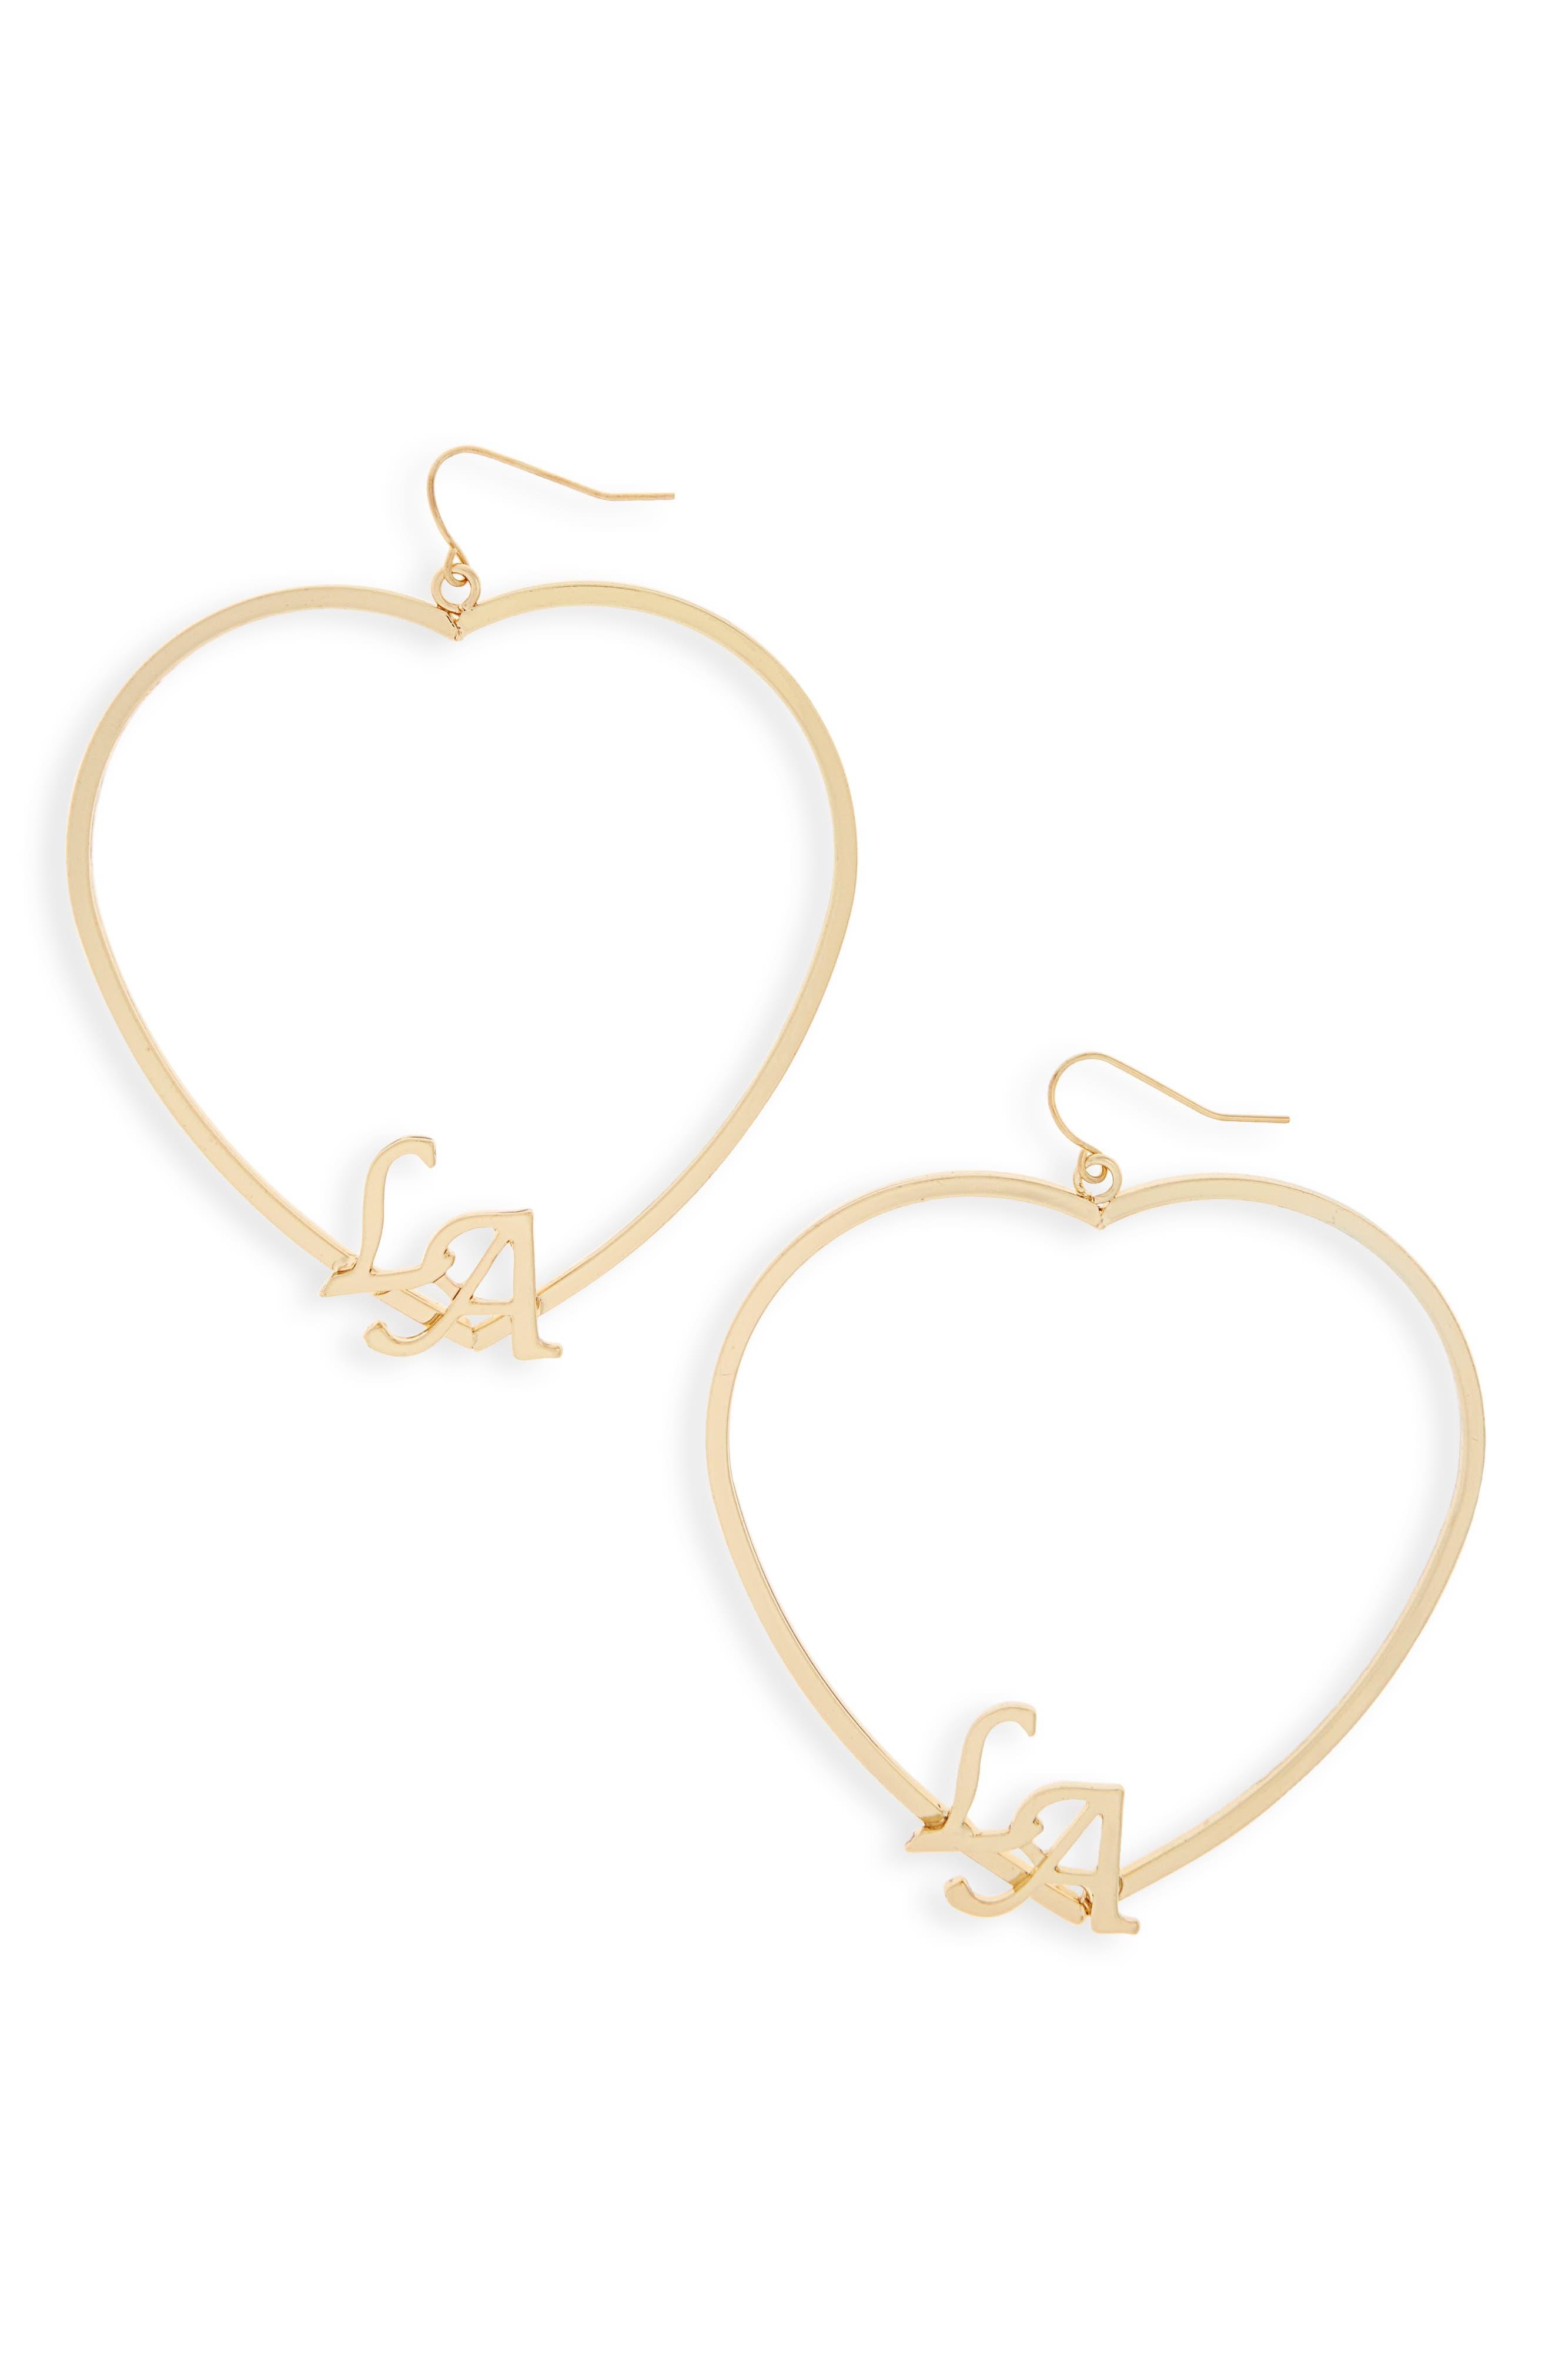 Alternate Image 1 Selected - BP. LA Heart Earrings